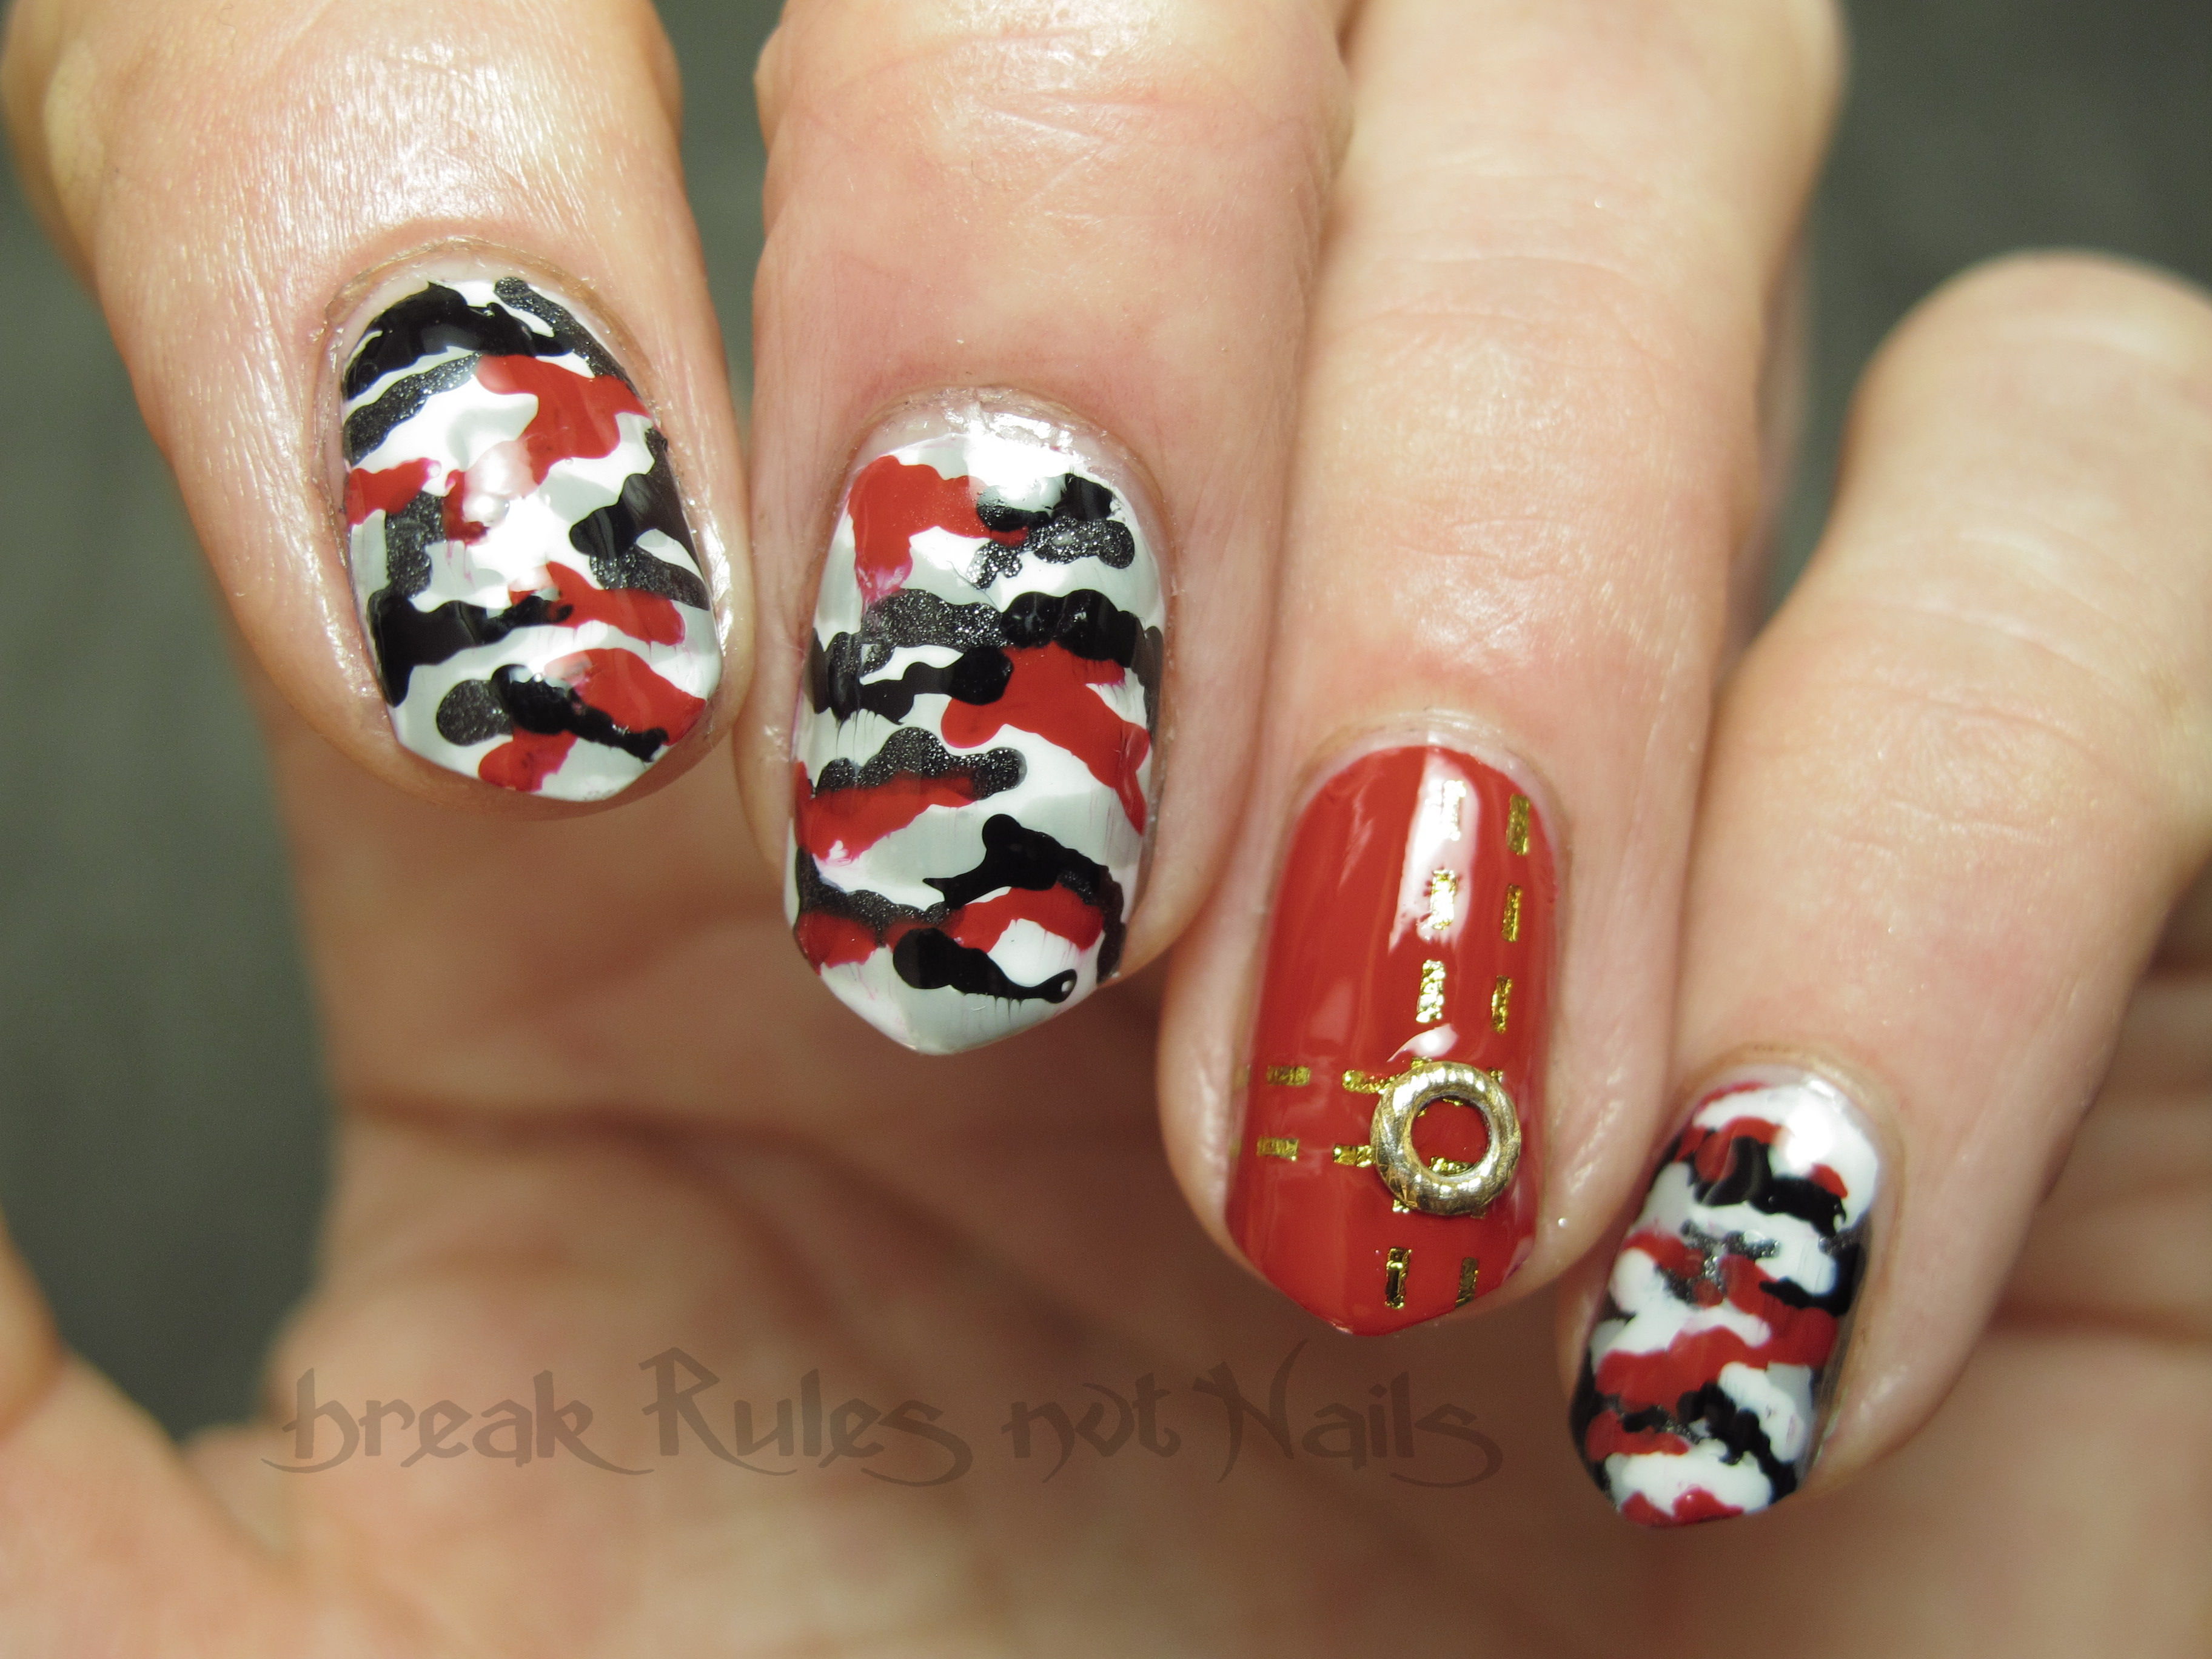 red kamo nail art | Break rules, not nails